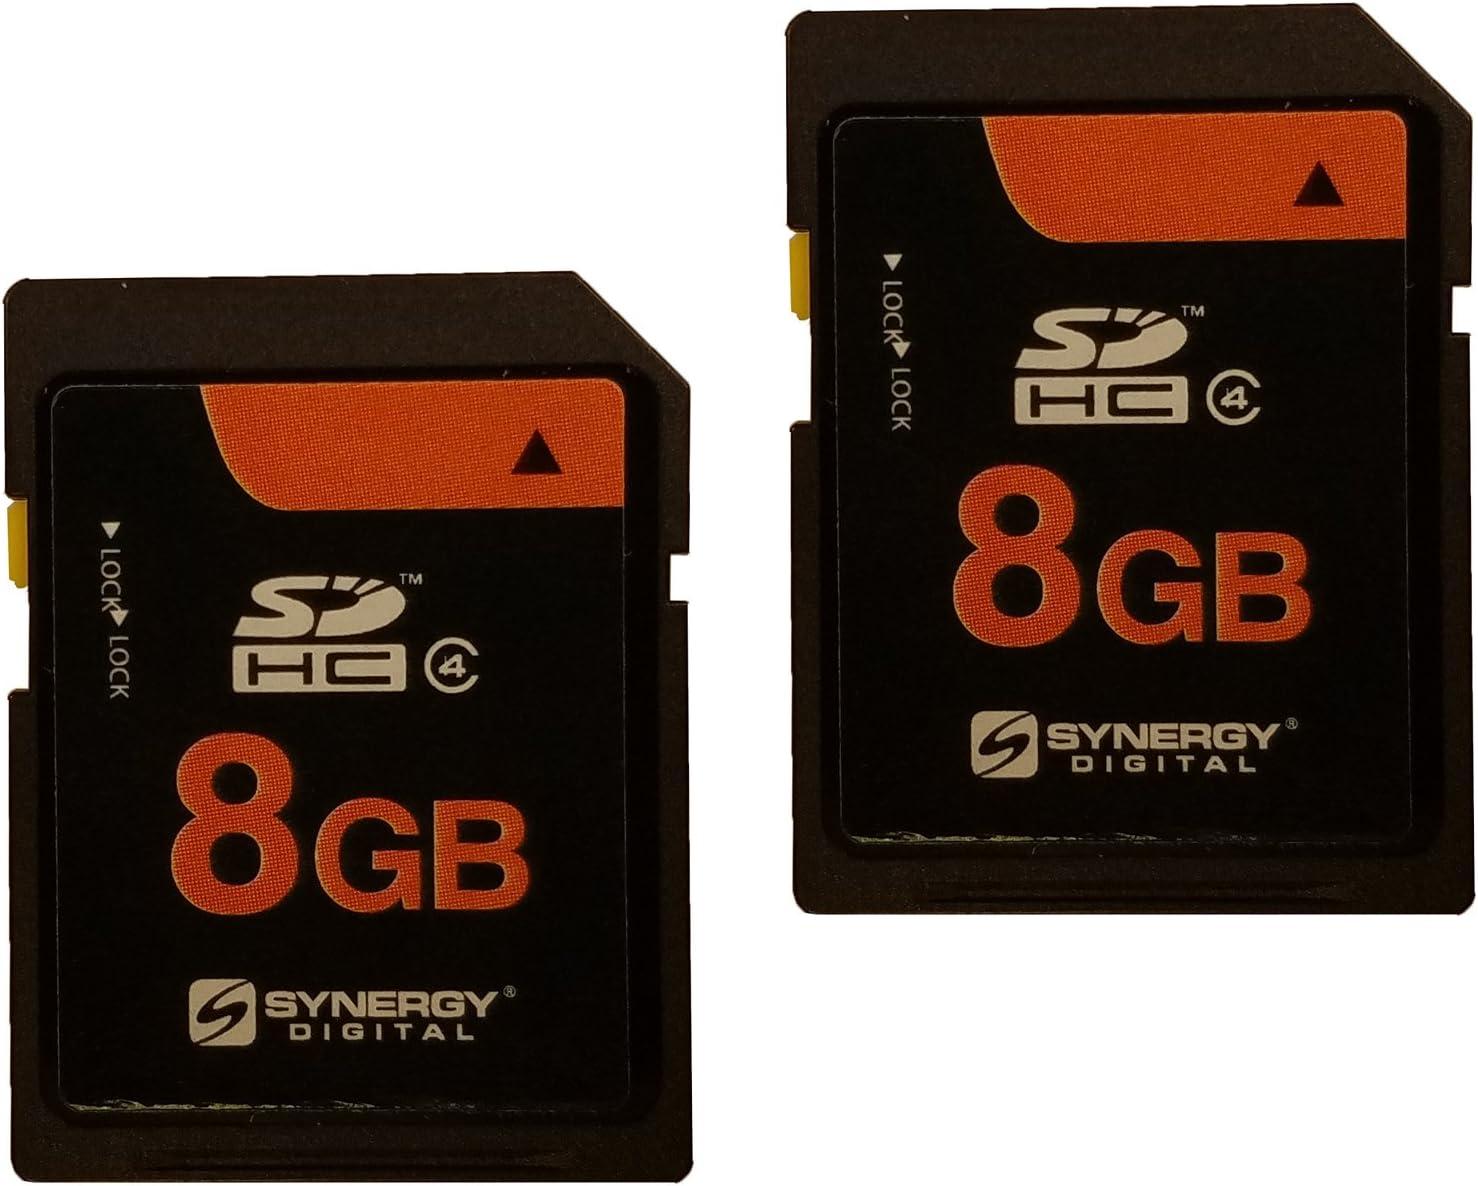 Pentax K-r Digital Camera Memory Card 2 x 8GB Secure Digital High Capacity (SDHC) Memory Cards (2 Pack)